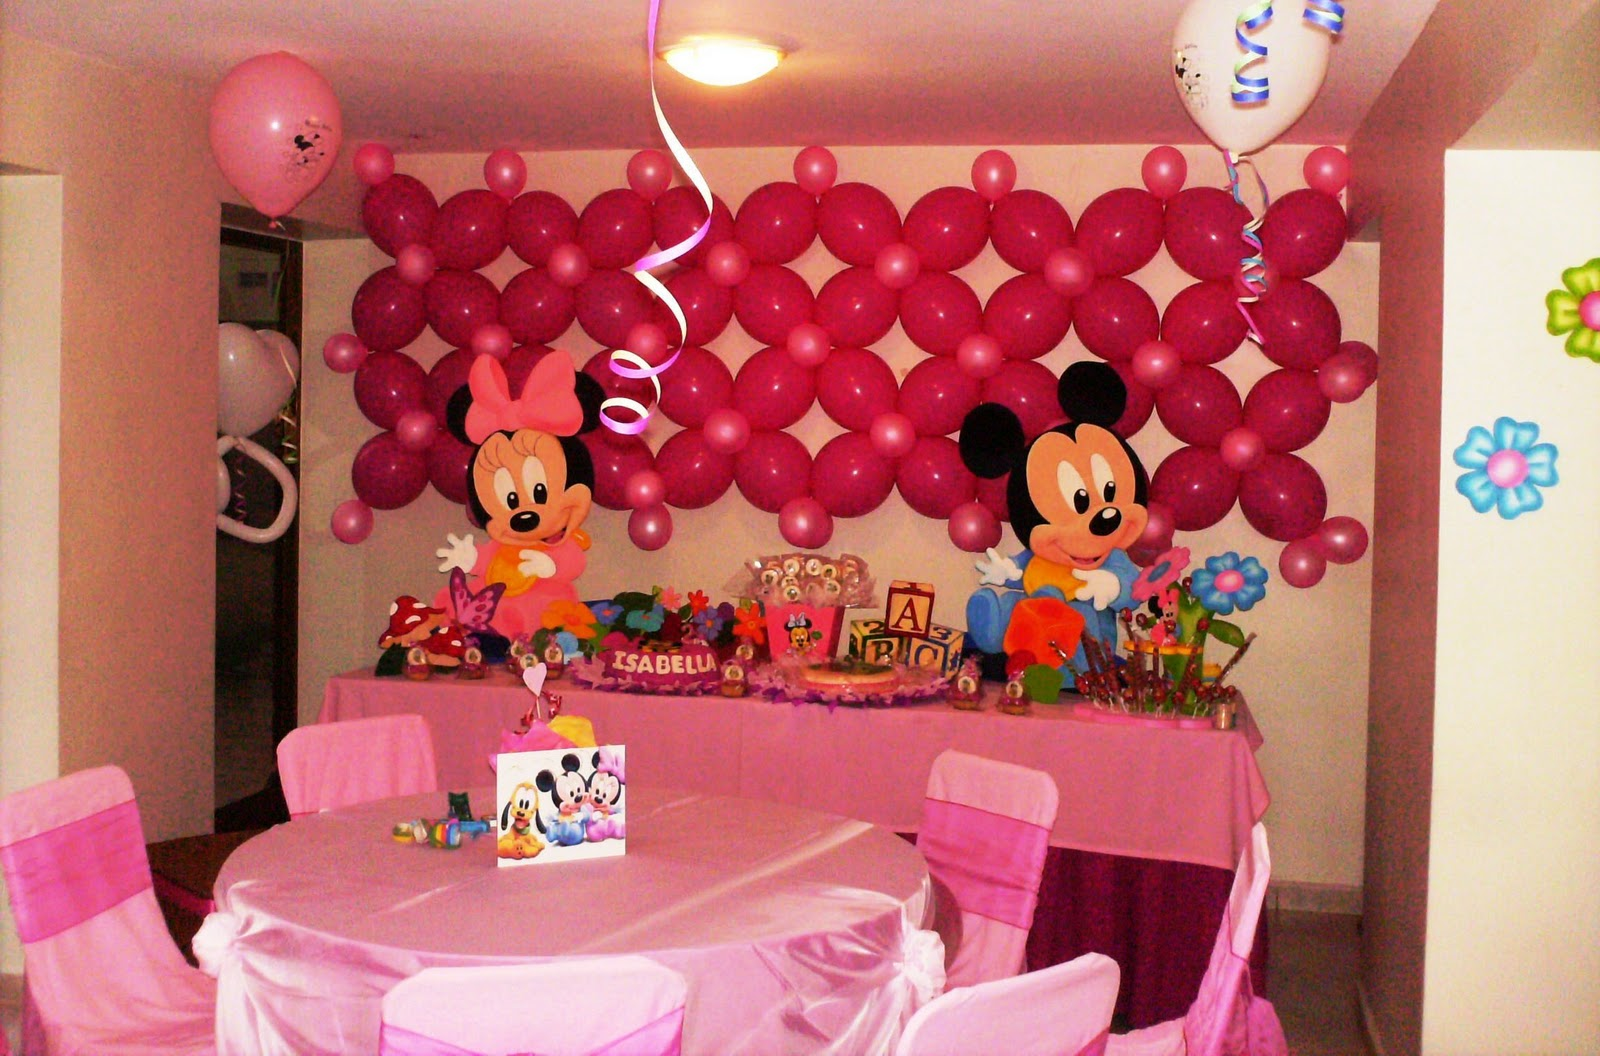 Minnie Decoraciones Fiestas Infantiles ~ Creaciones Ramsesa Decoraciones Fiestas Infantiles